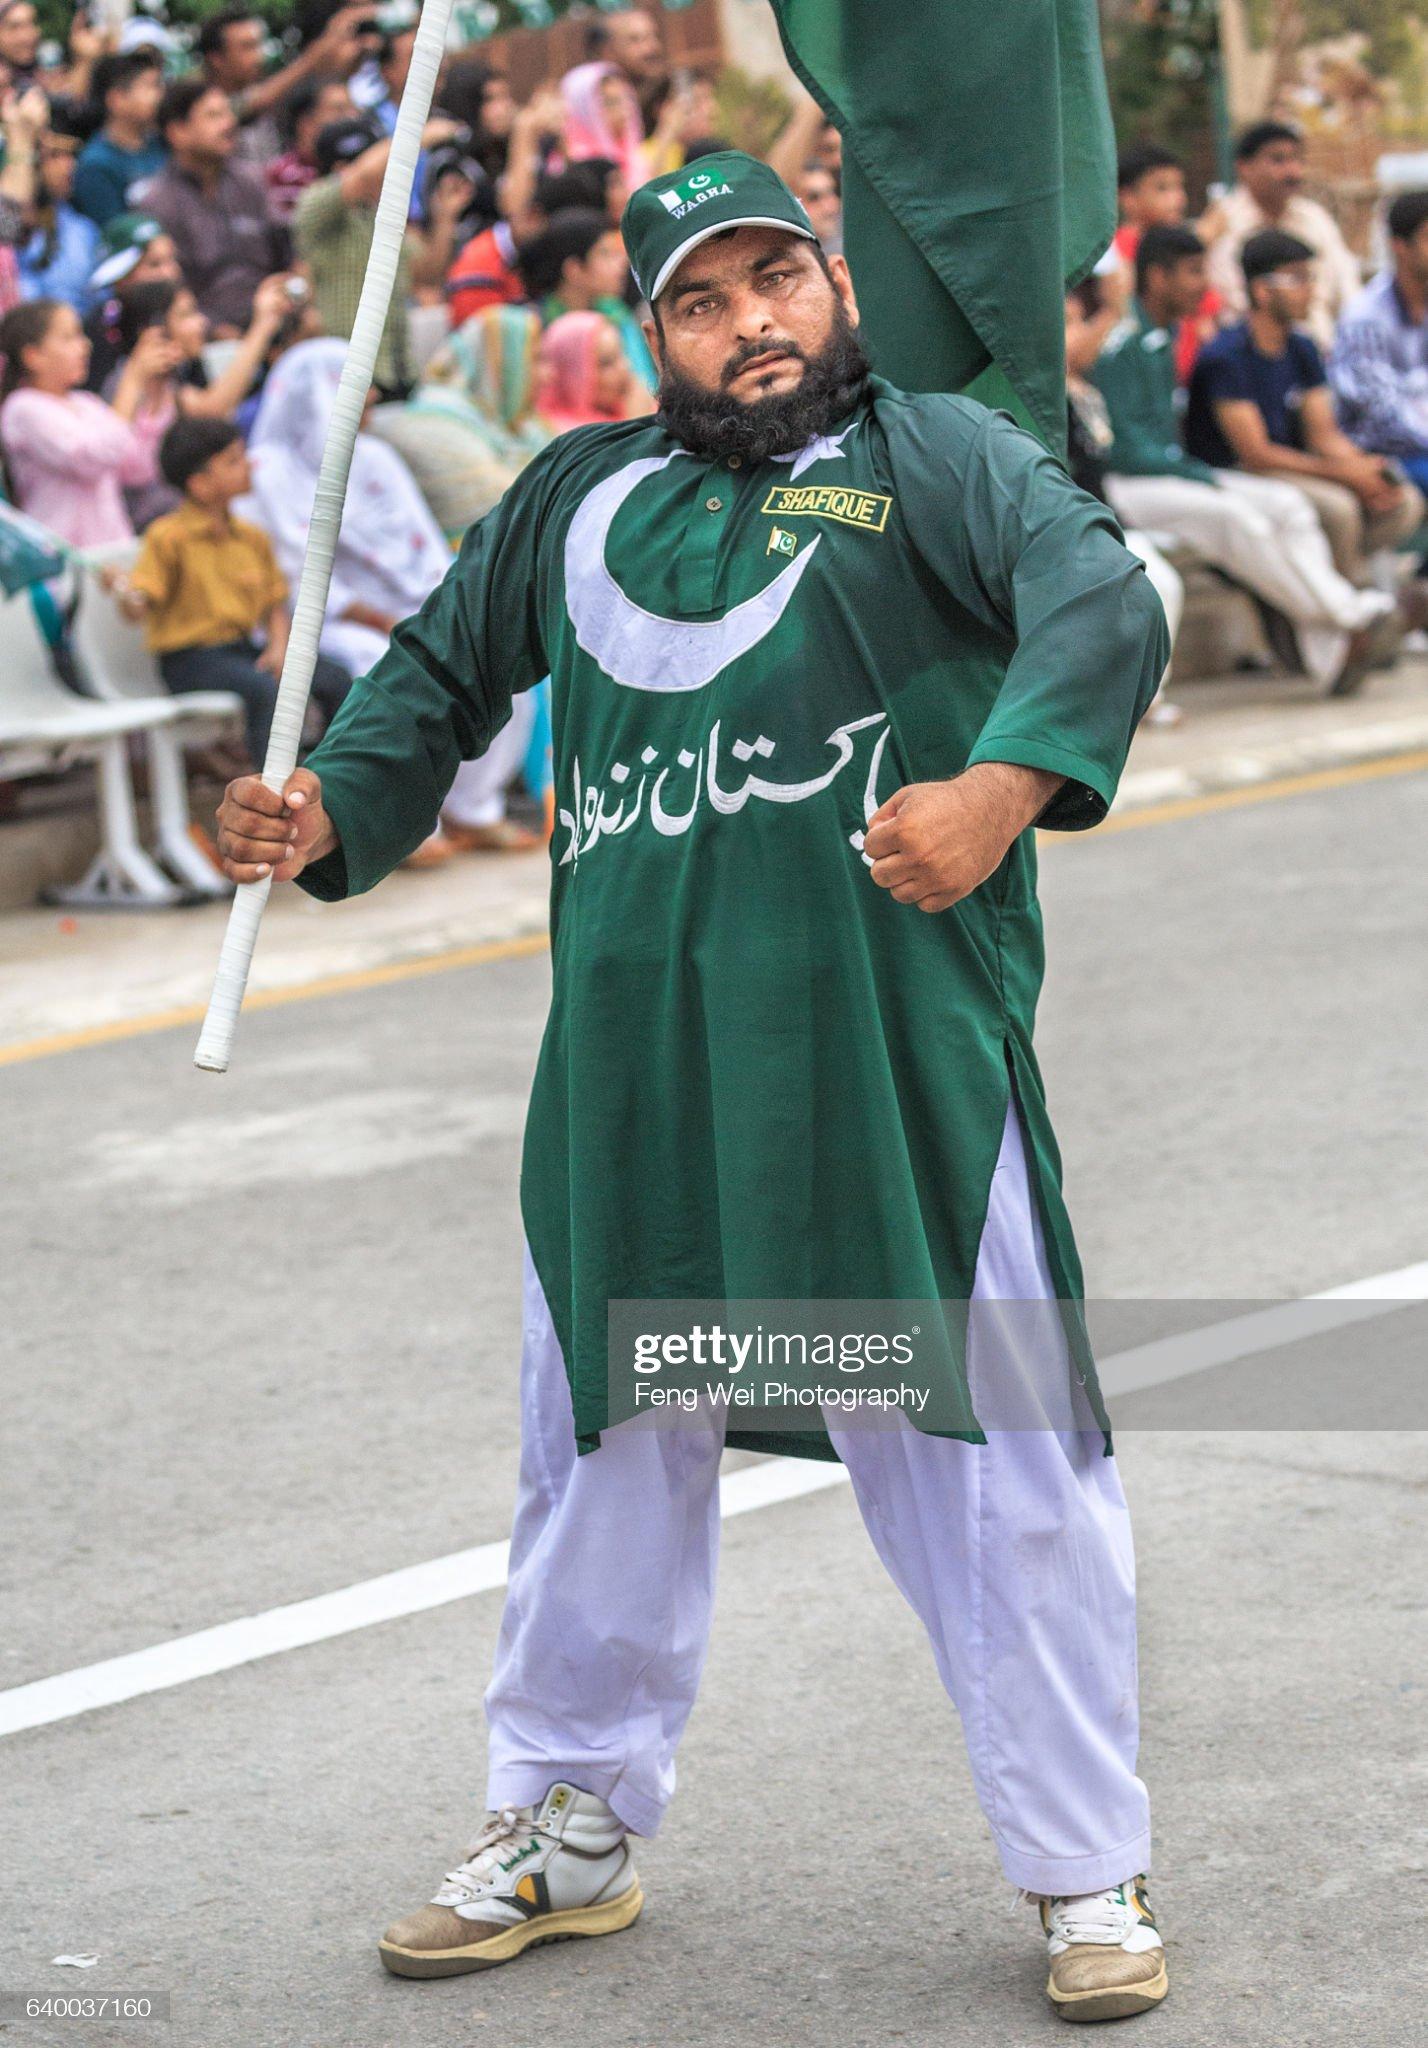 Pakistan Ranger Holding National Flag @ Wagah Border Ceremony, Punjab, Pakistan, August 2015 : Stock Photo